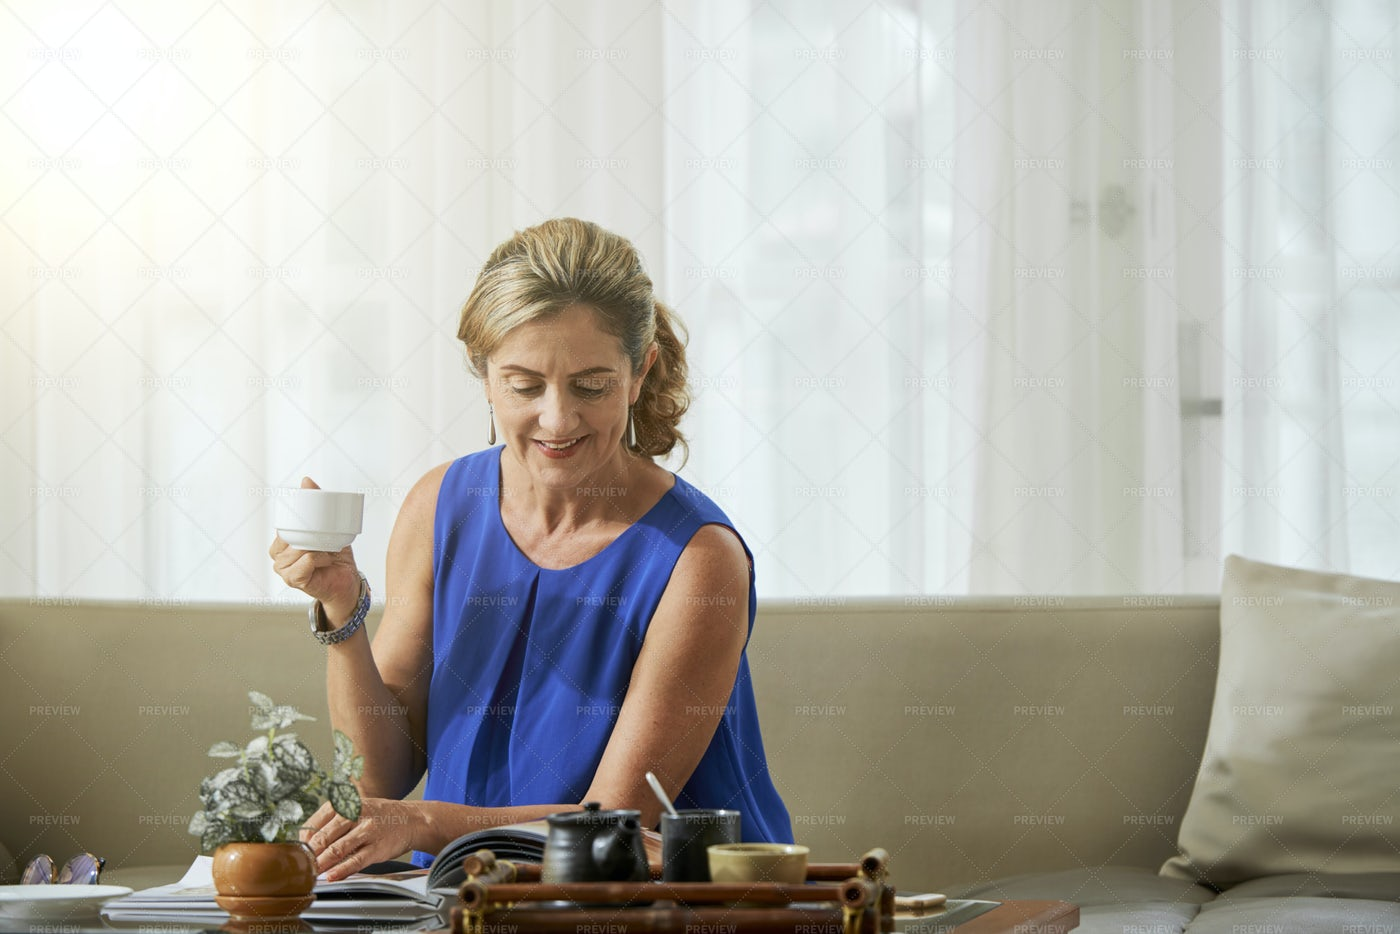 Woman Reading A Magazine: Stock Photos